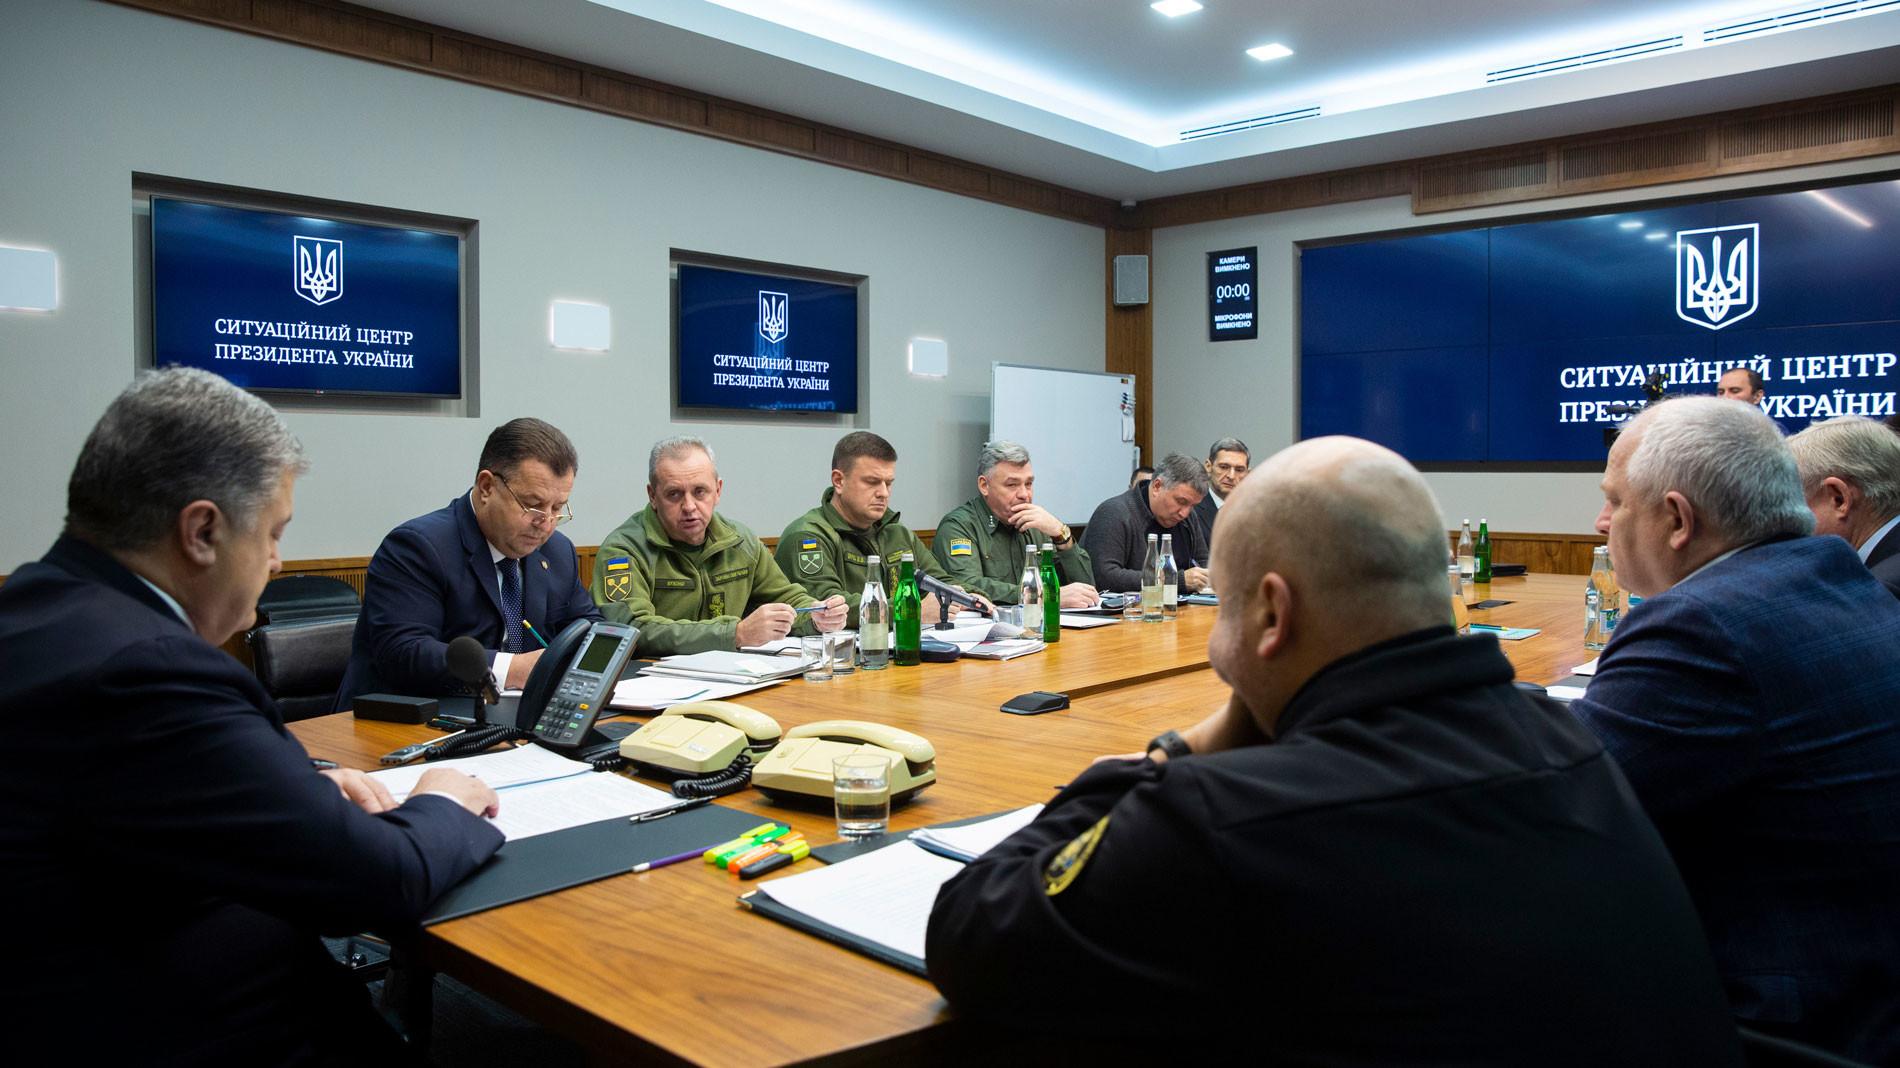 Фото: © Mykhailo Markiv, Presidential Press Service via AP, Pool